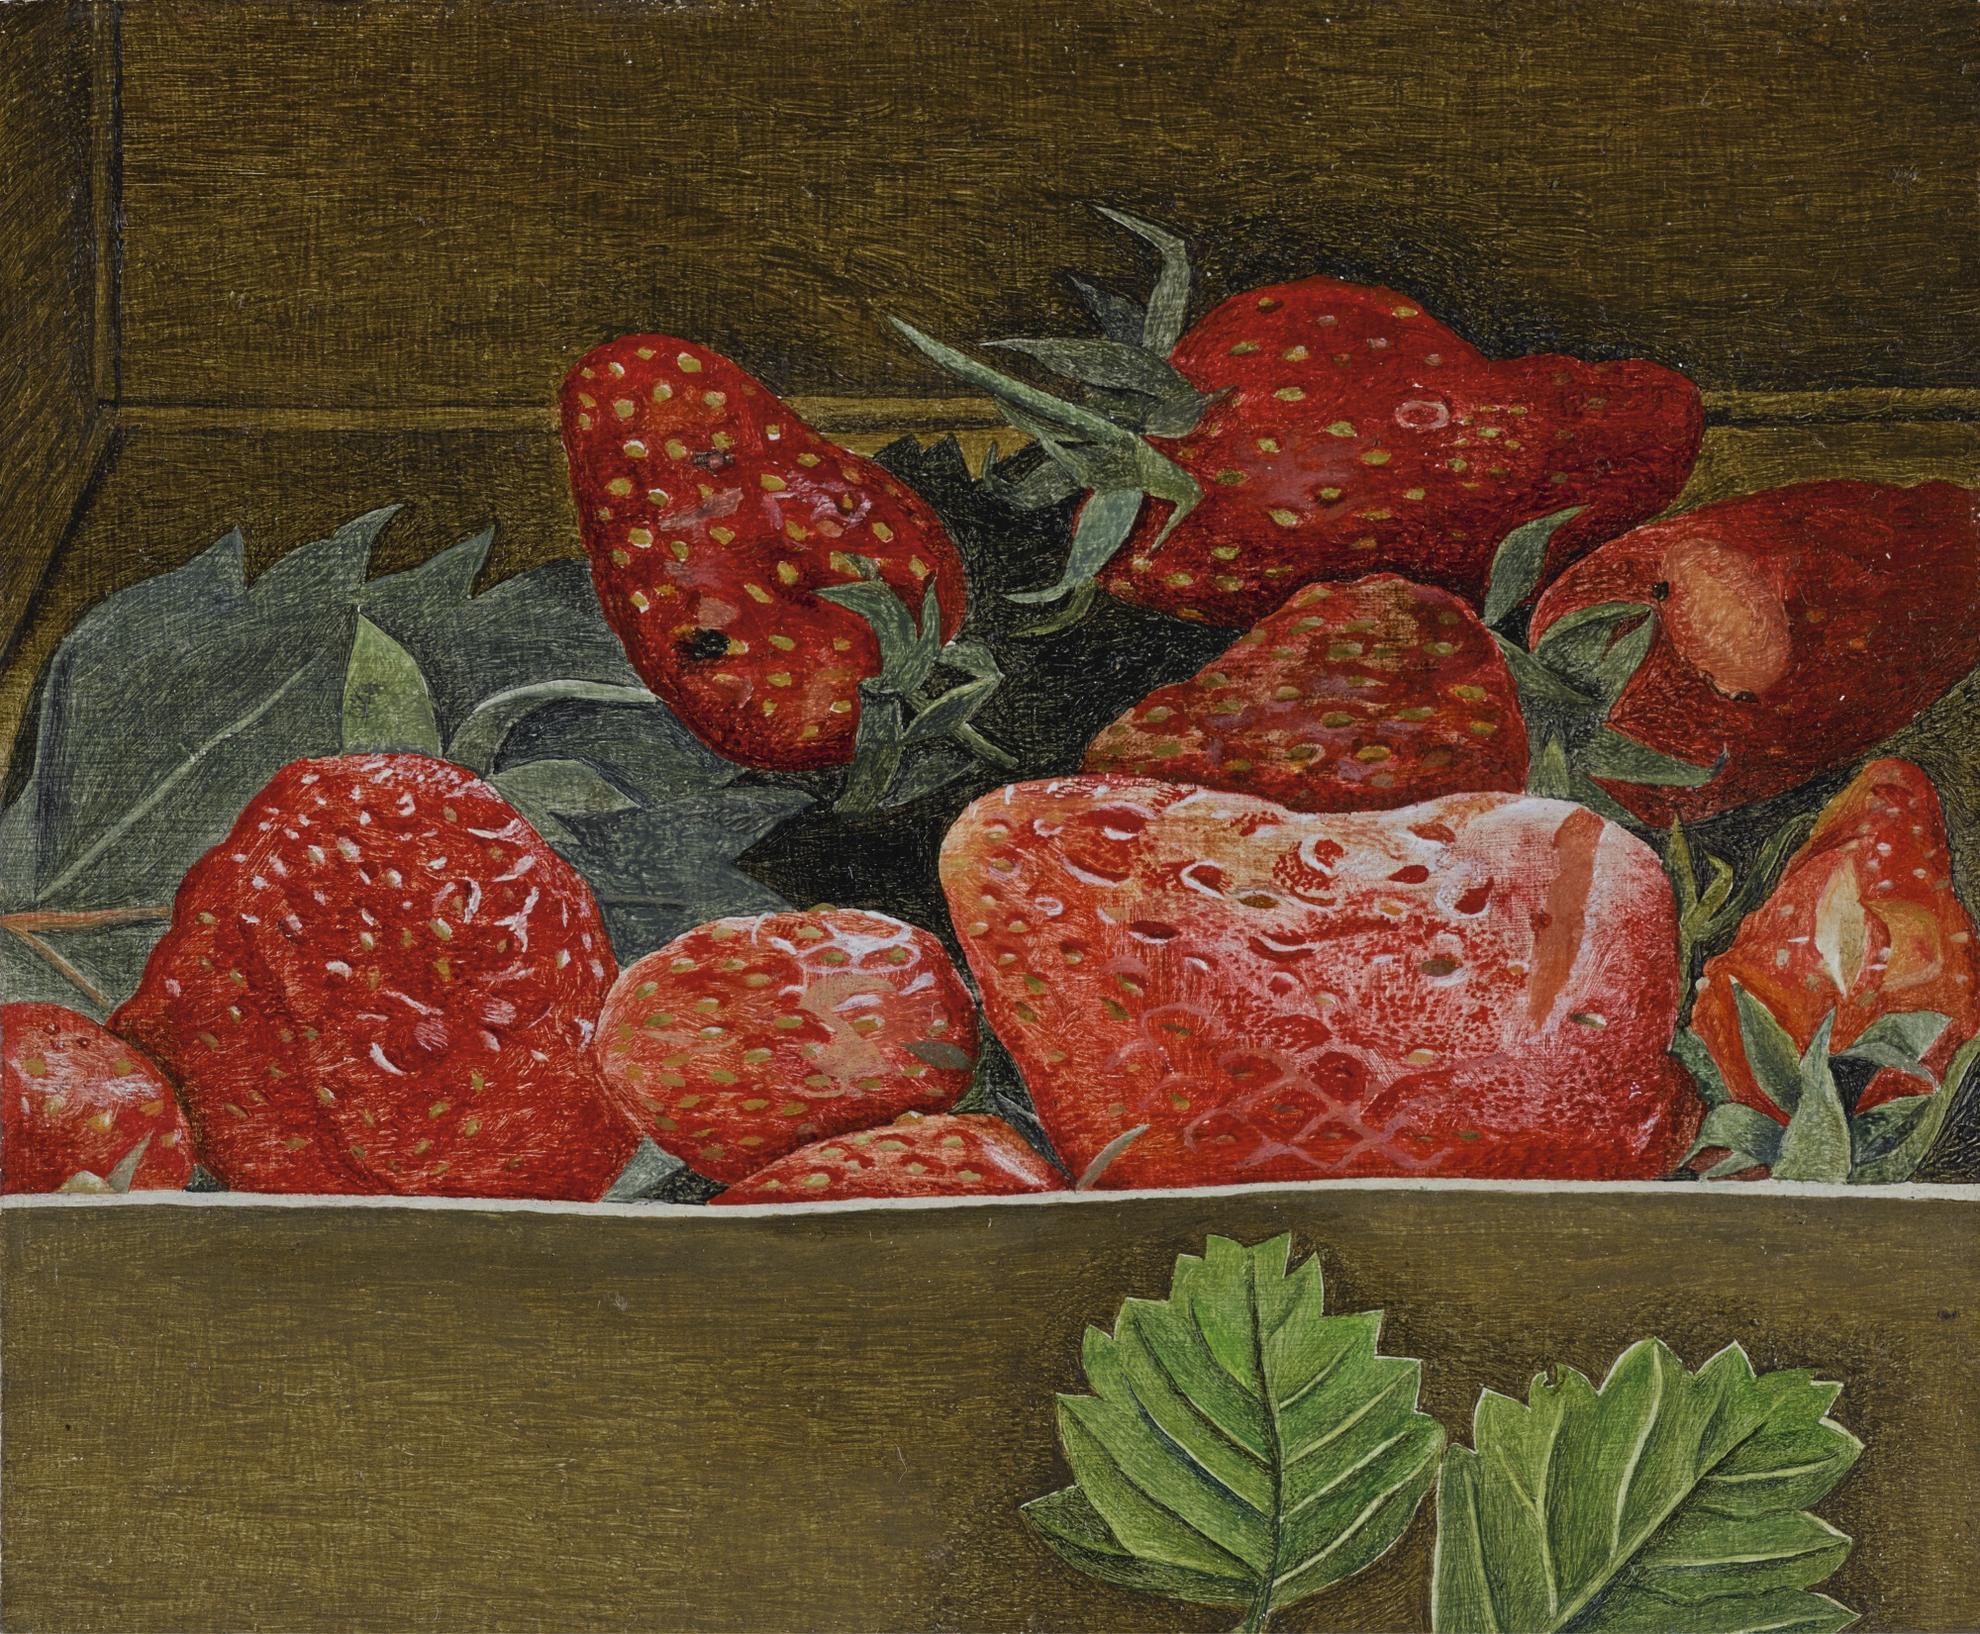 Lucian Freud-Strawberries-1950